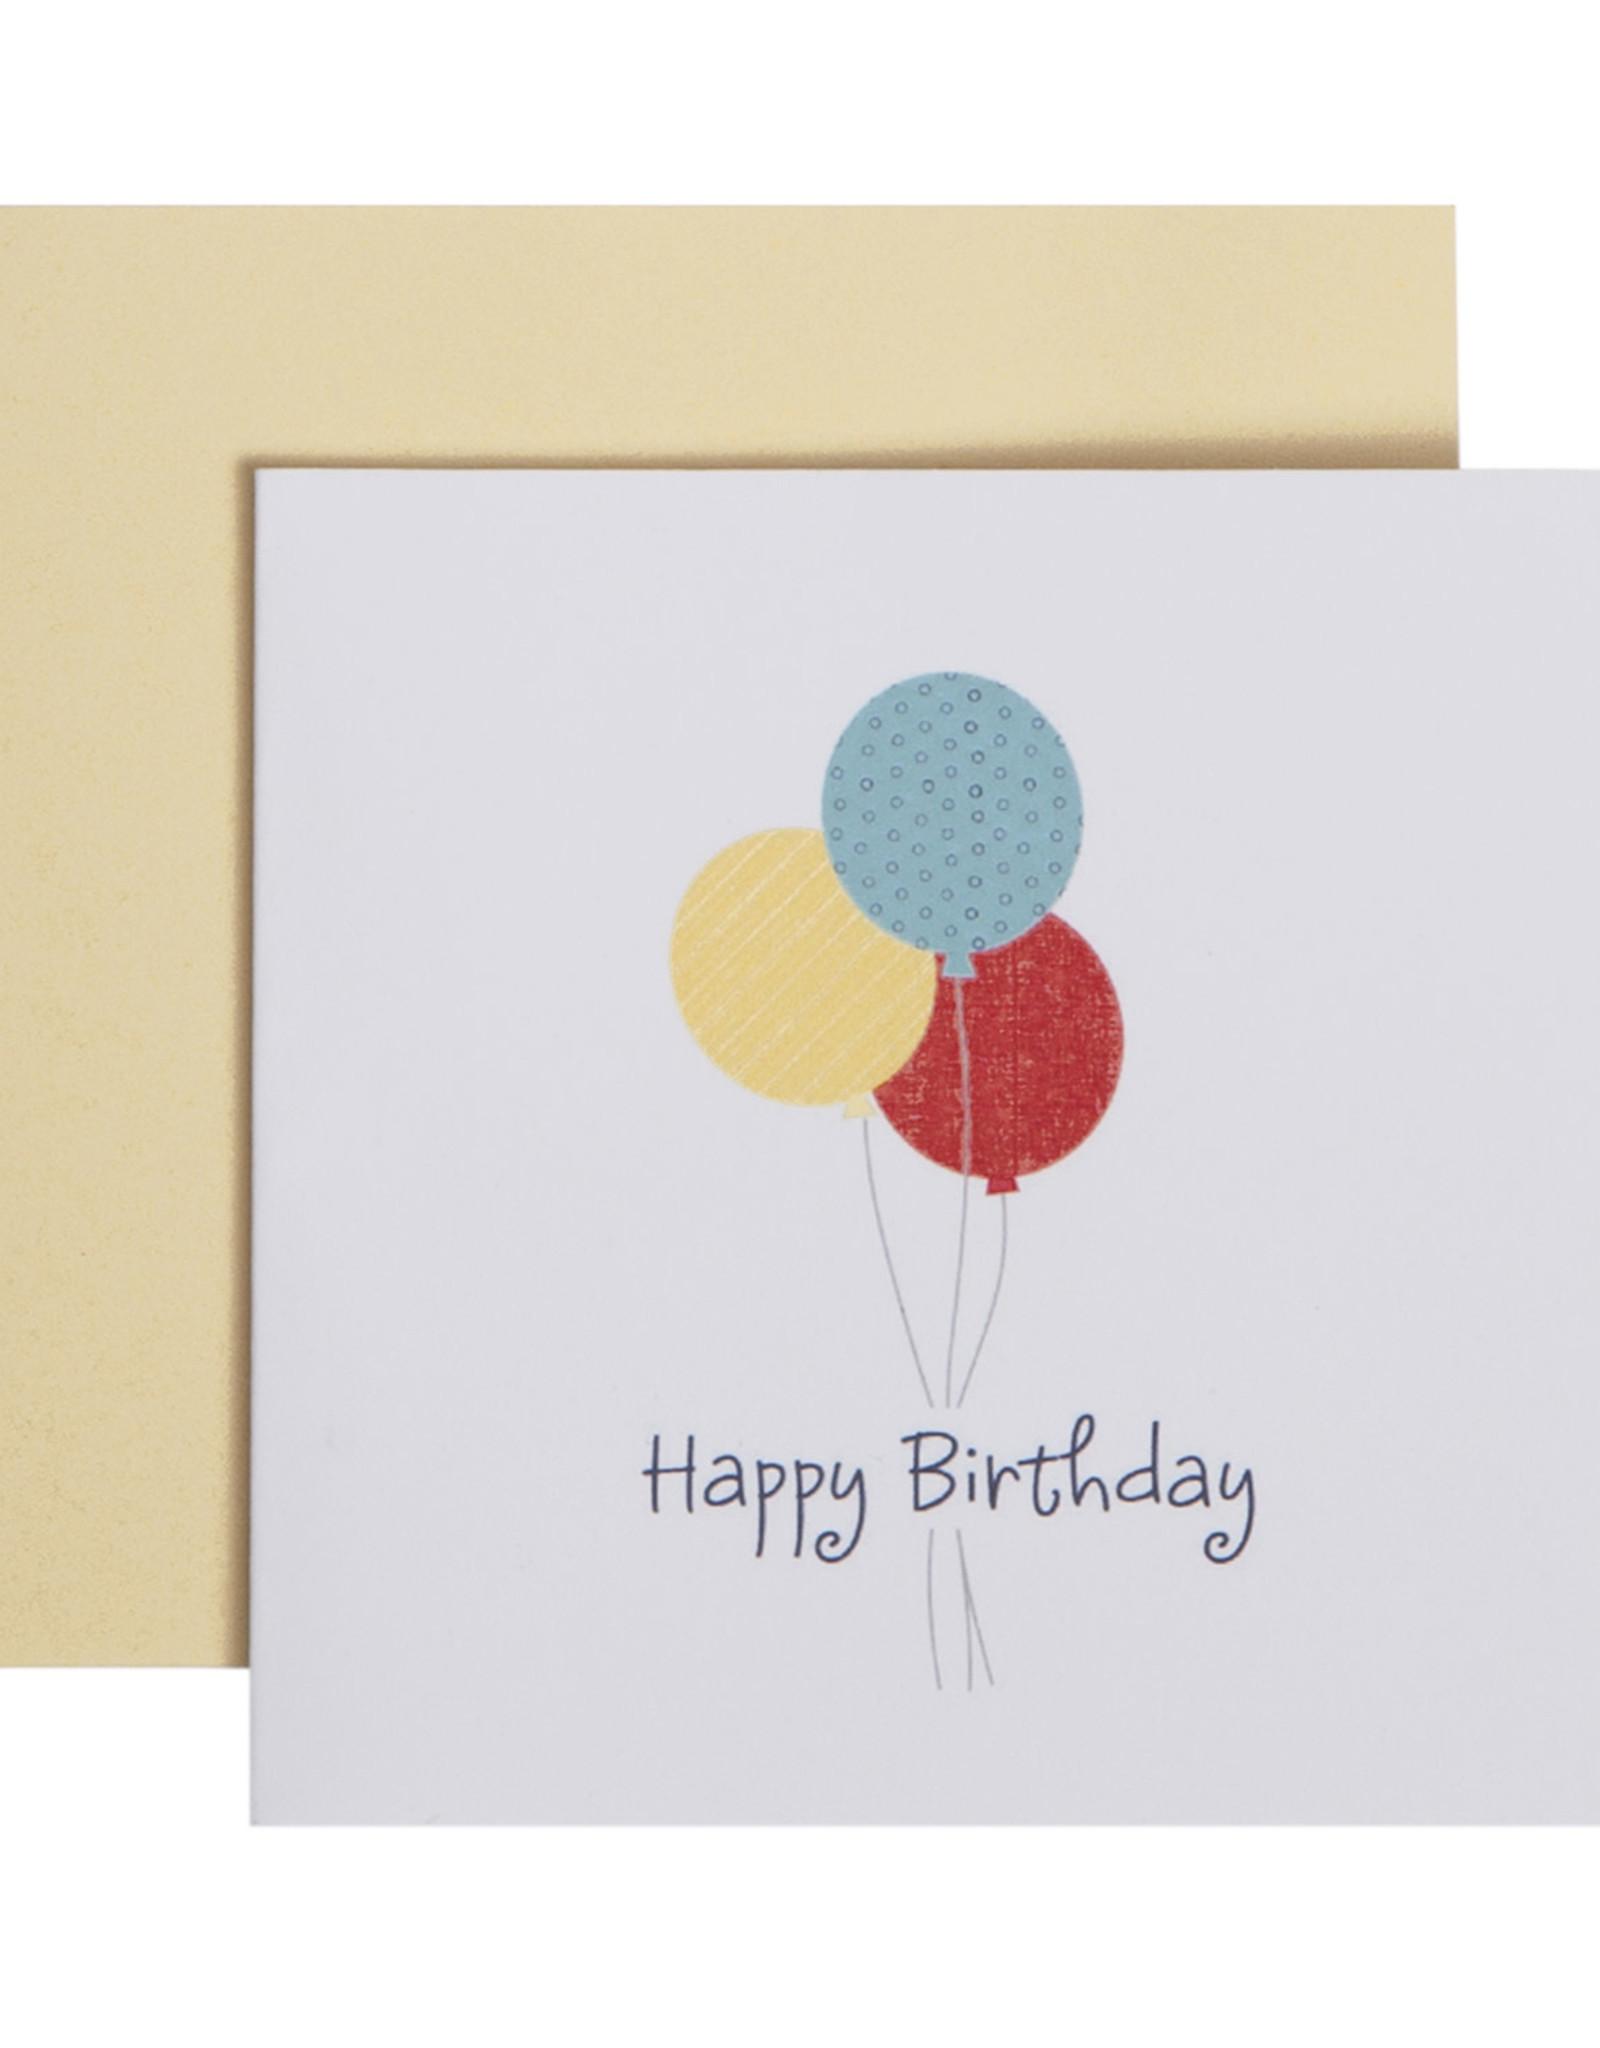 Mini Enclosure Card - Happy Birthday - Balloons